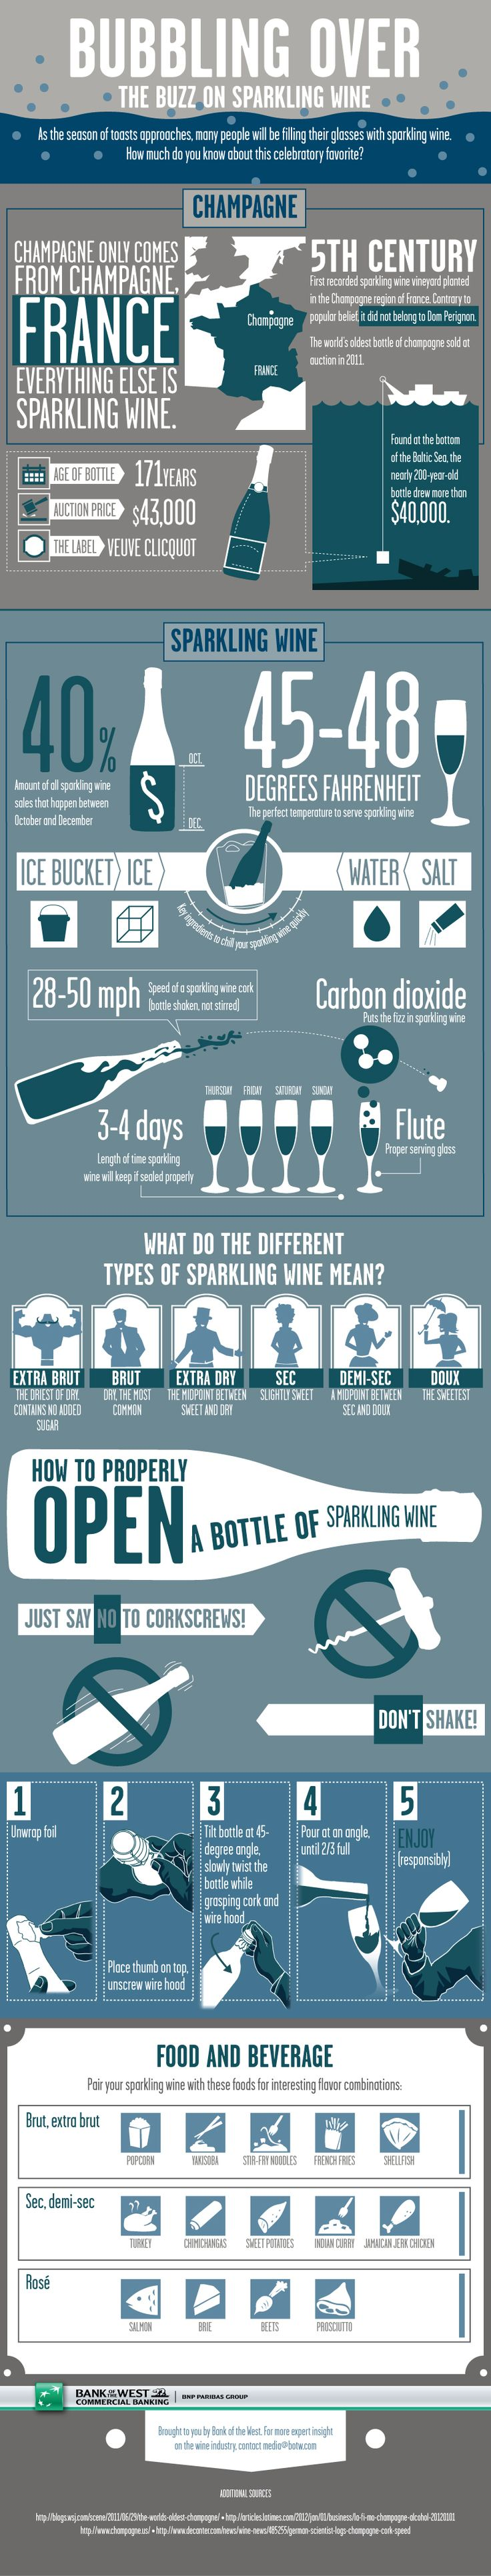 Sparkling Wine Infographic | #WineNight http://www.brioitalian.com/bar_brioso.html?view=full